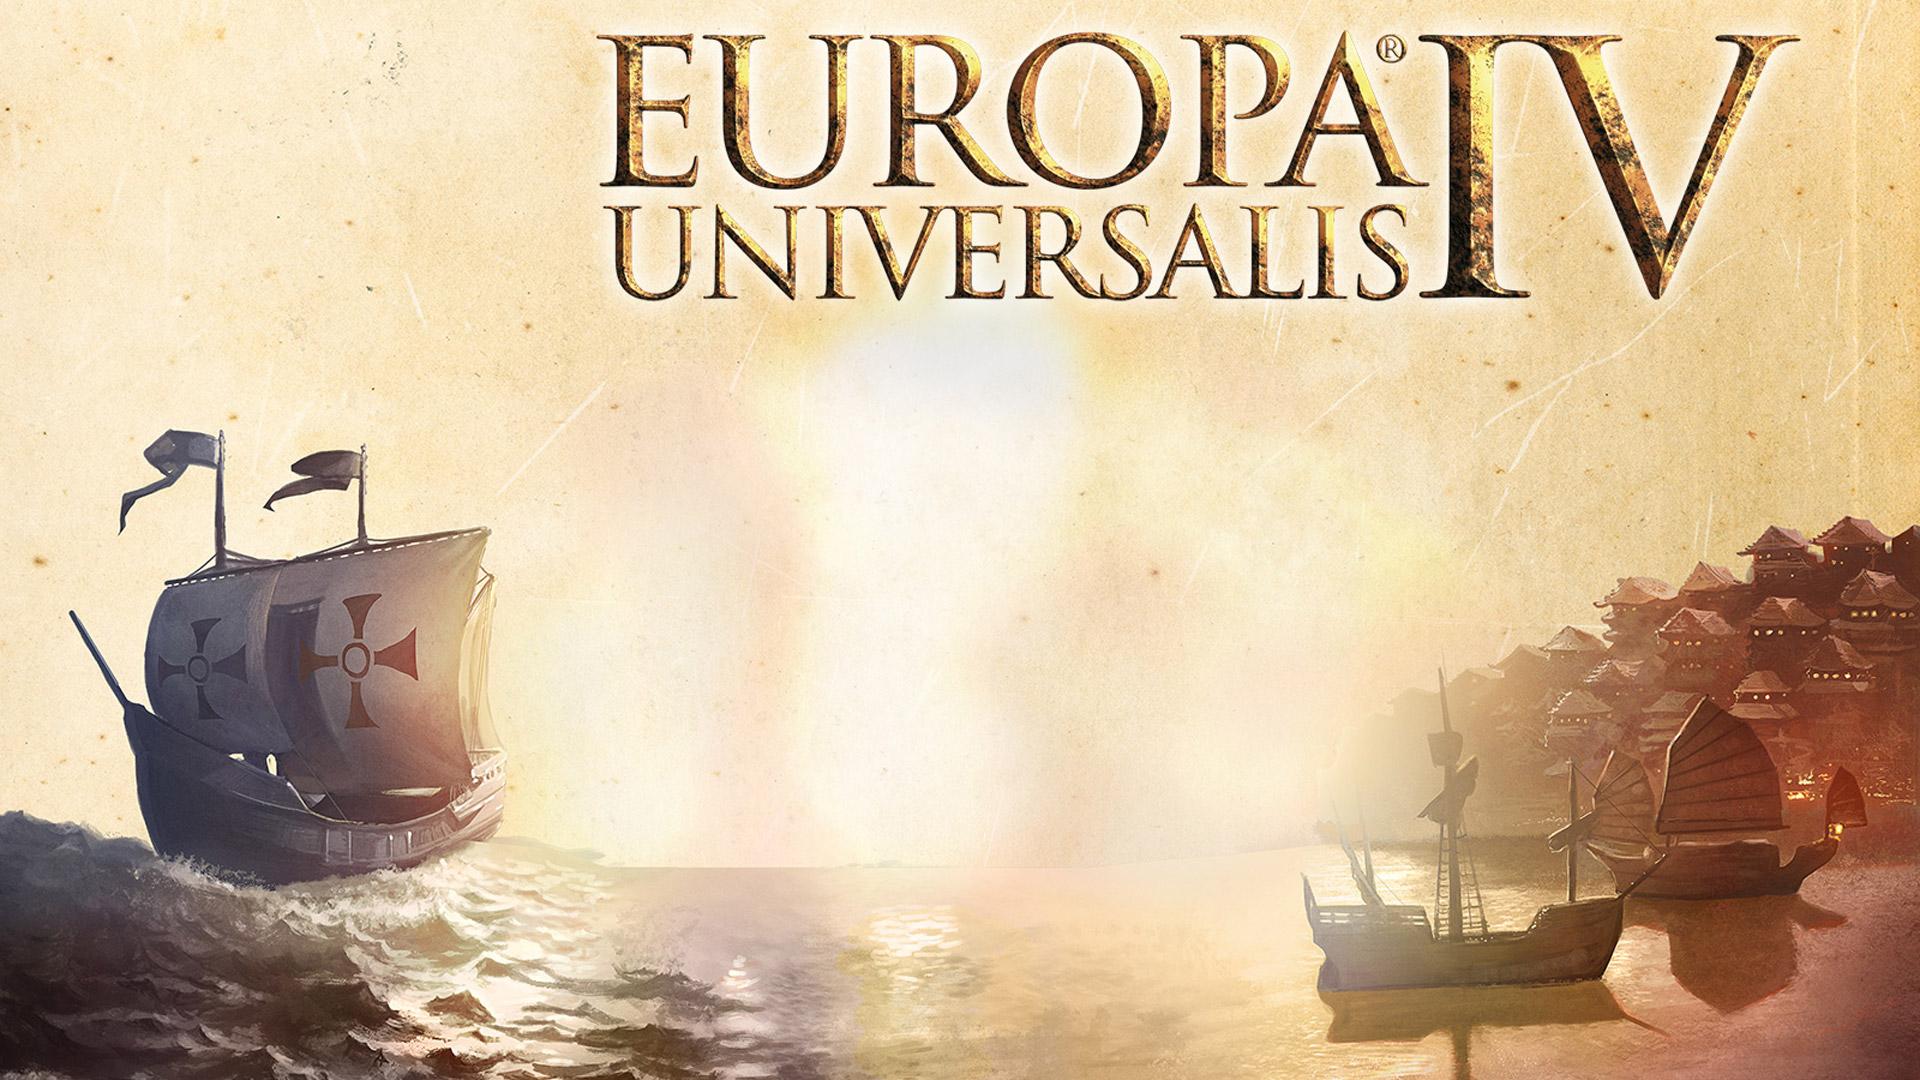 Free Europa Universalis IV Wallpaper in 1920x1080